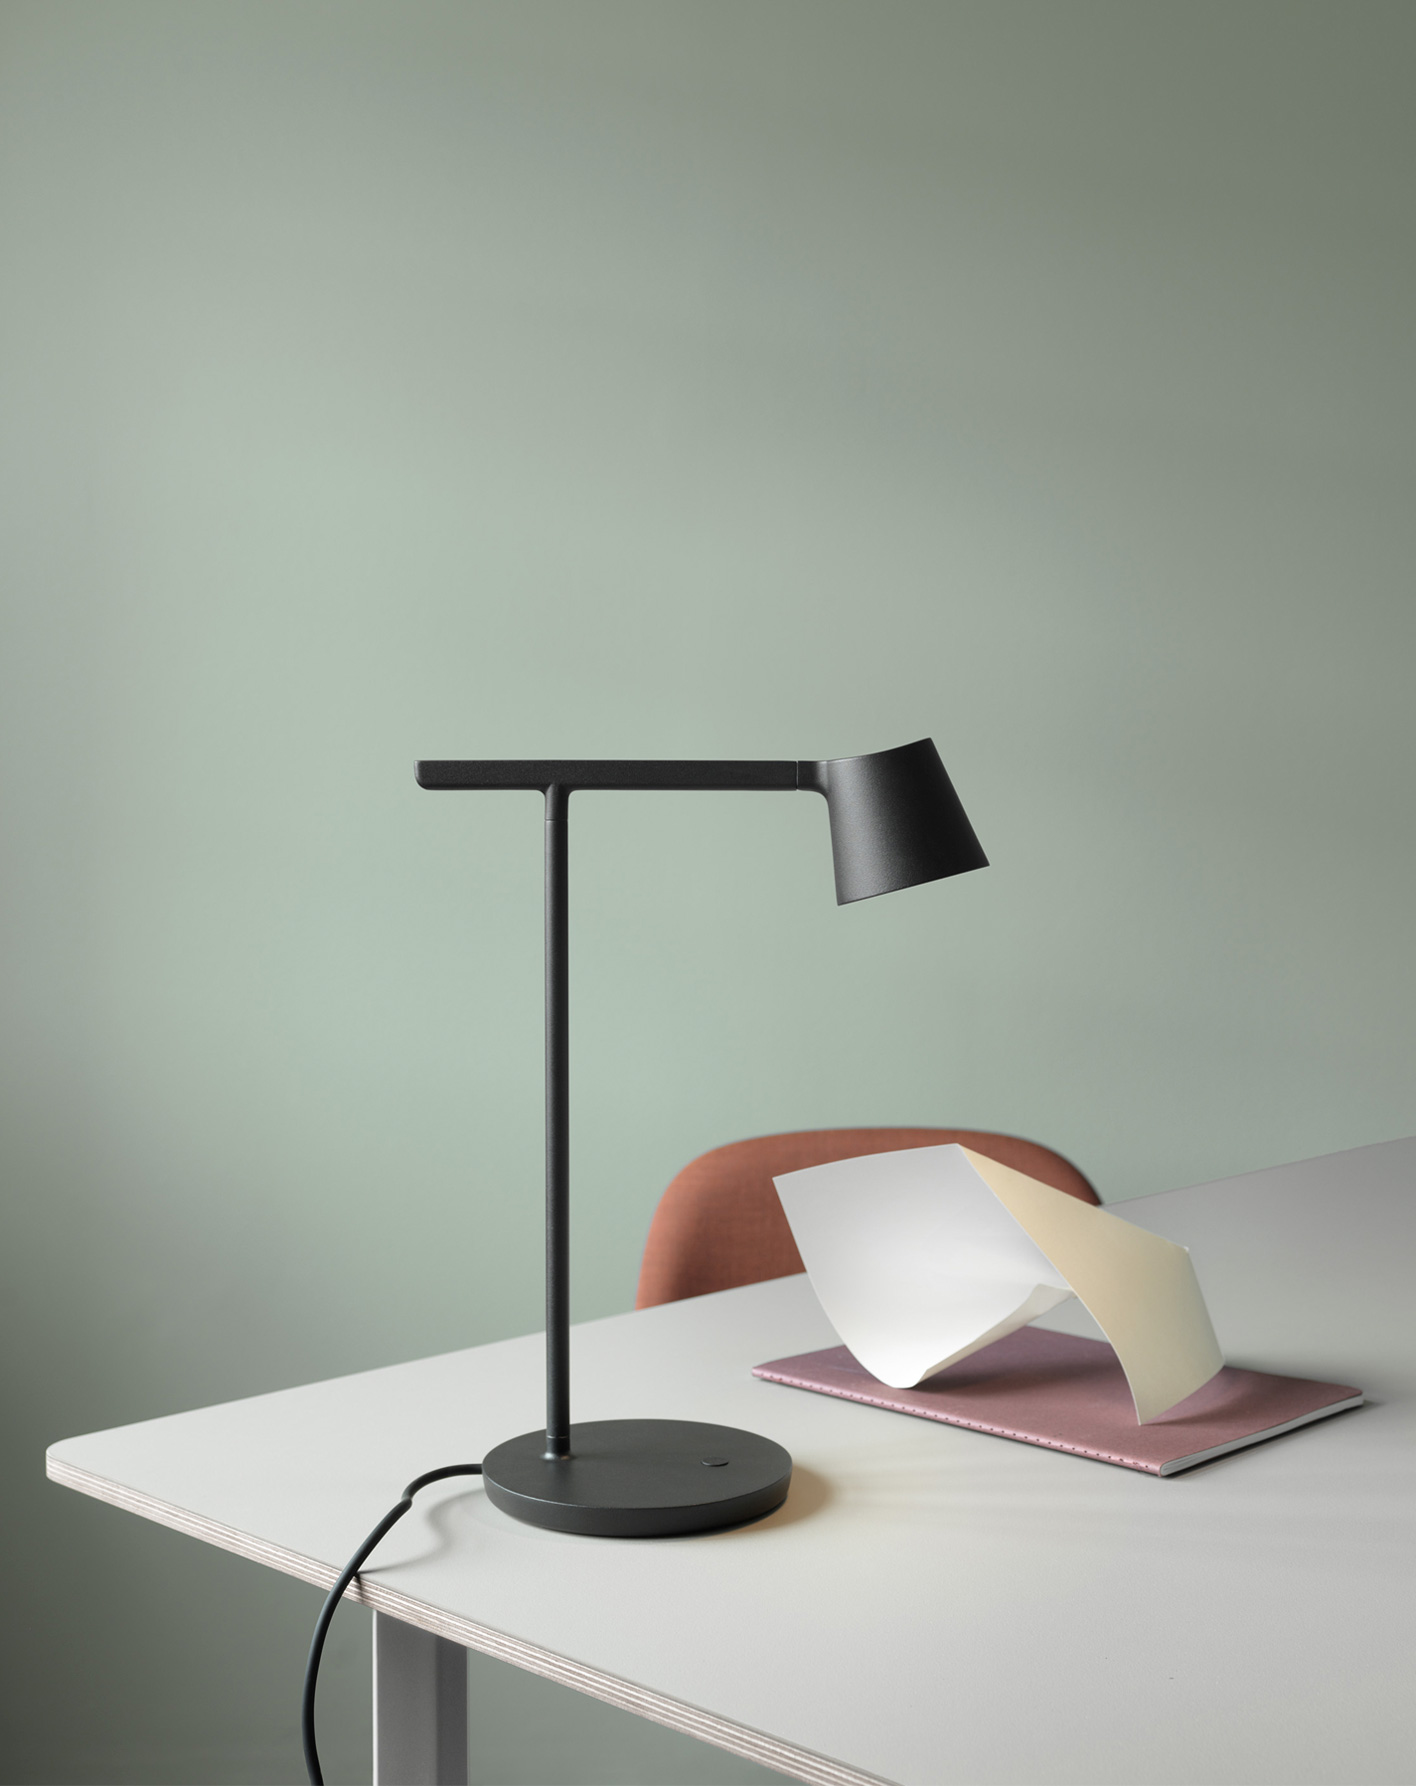 tip-lamp-black-70-70-table.jpg